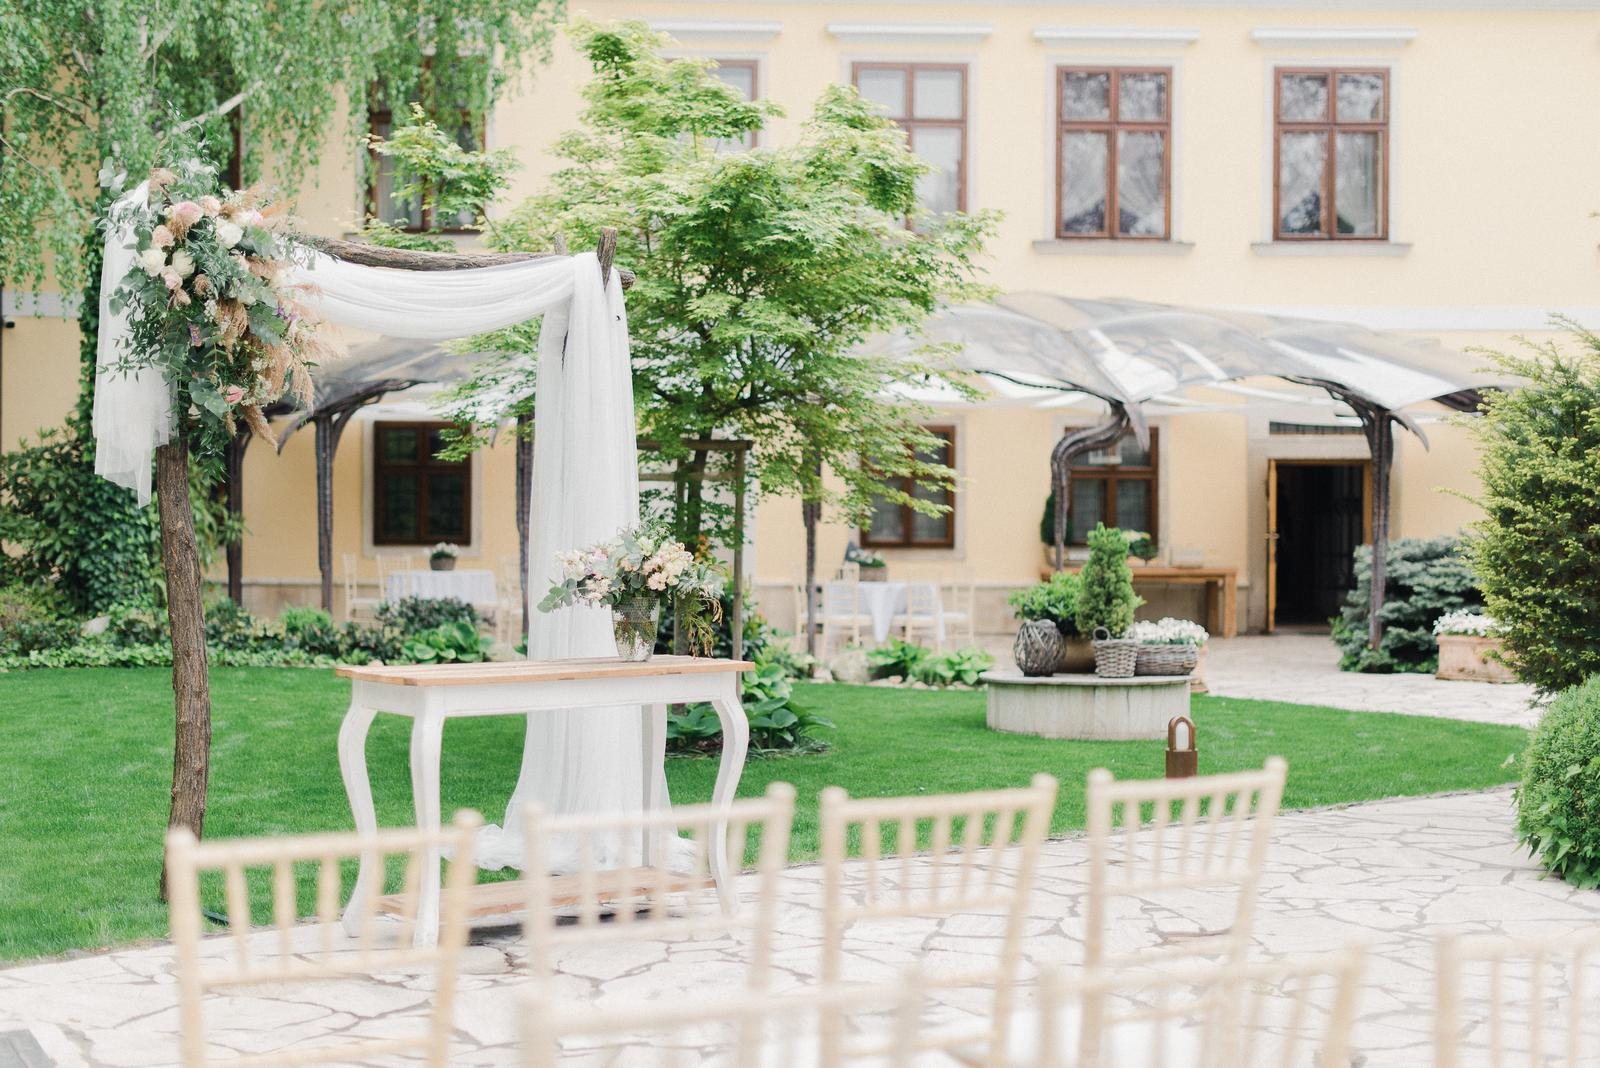 Castel Pension & Restaurant - Foto: http://www.gabrielajarkovska.com/